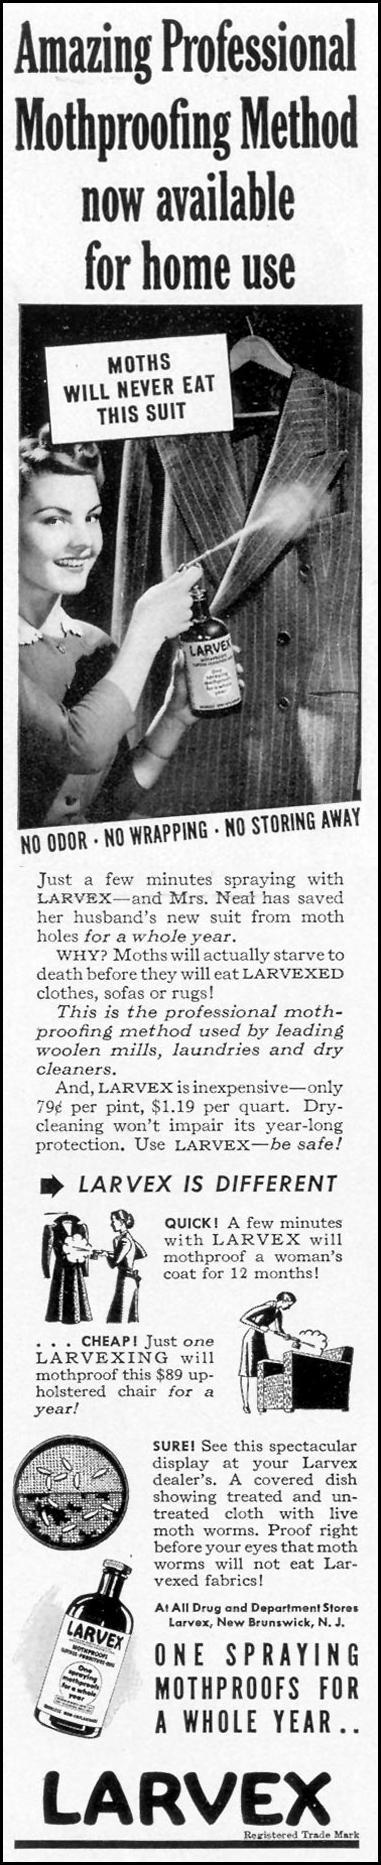 LARVEX MOTHPROOFING LIFE 06/01/1942 p. 68